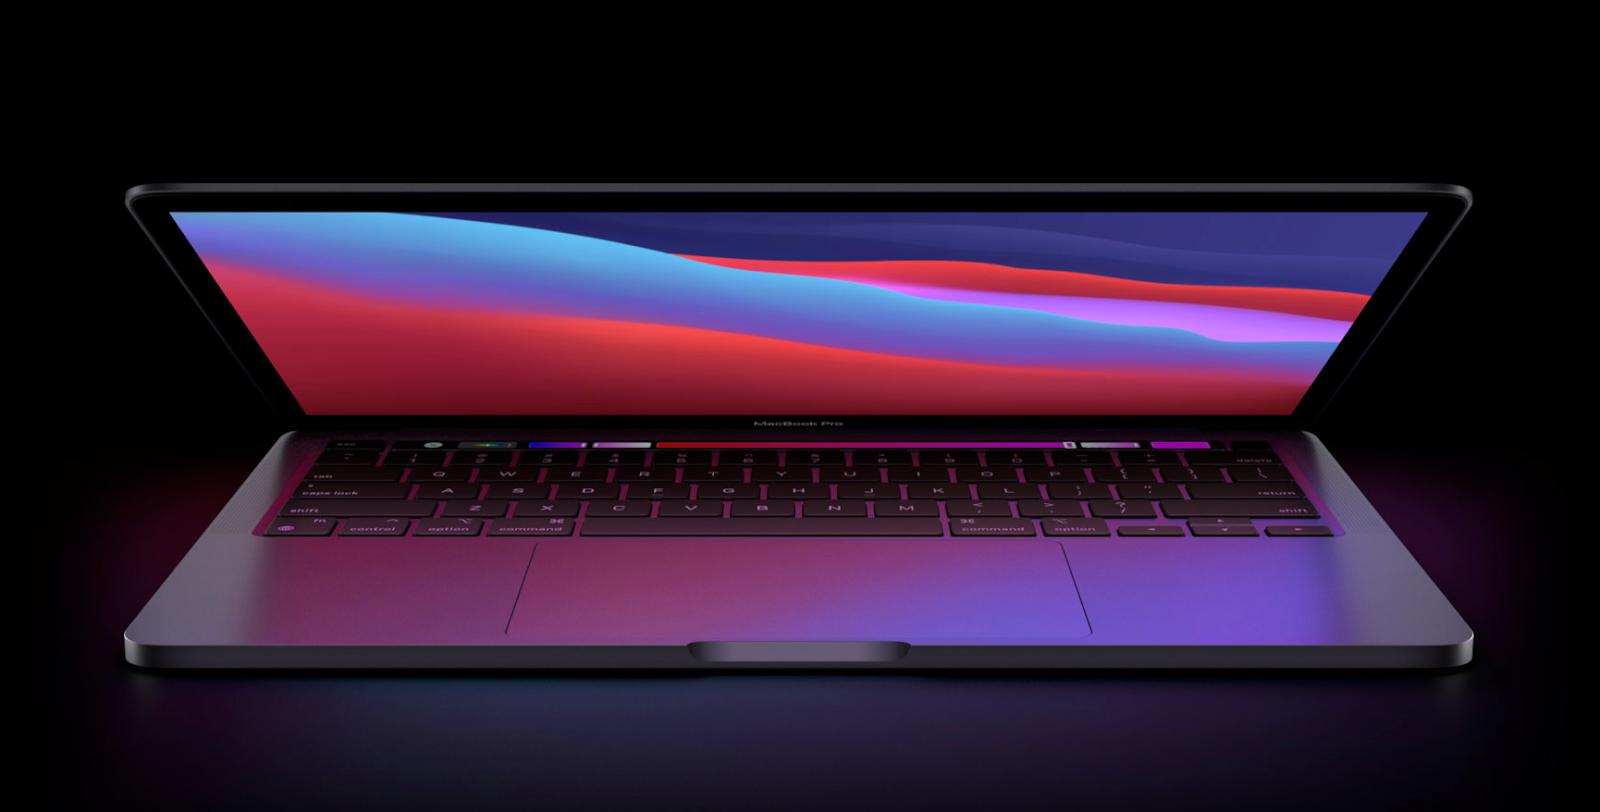 13-inch MacBook Pro (Intel-based)